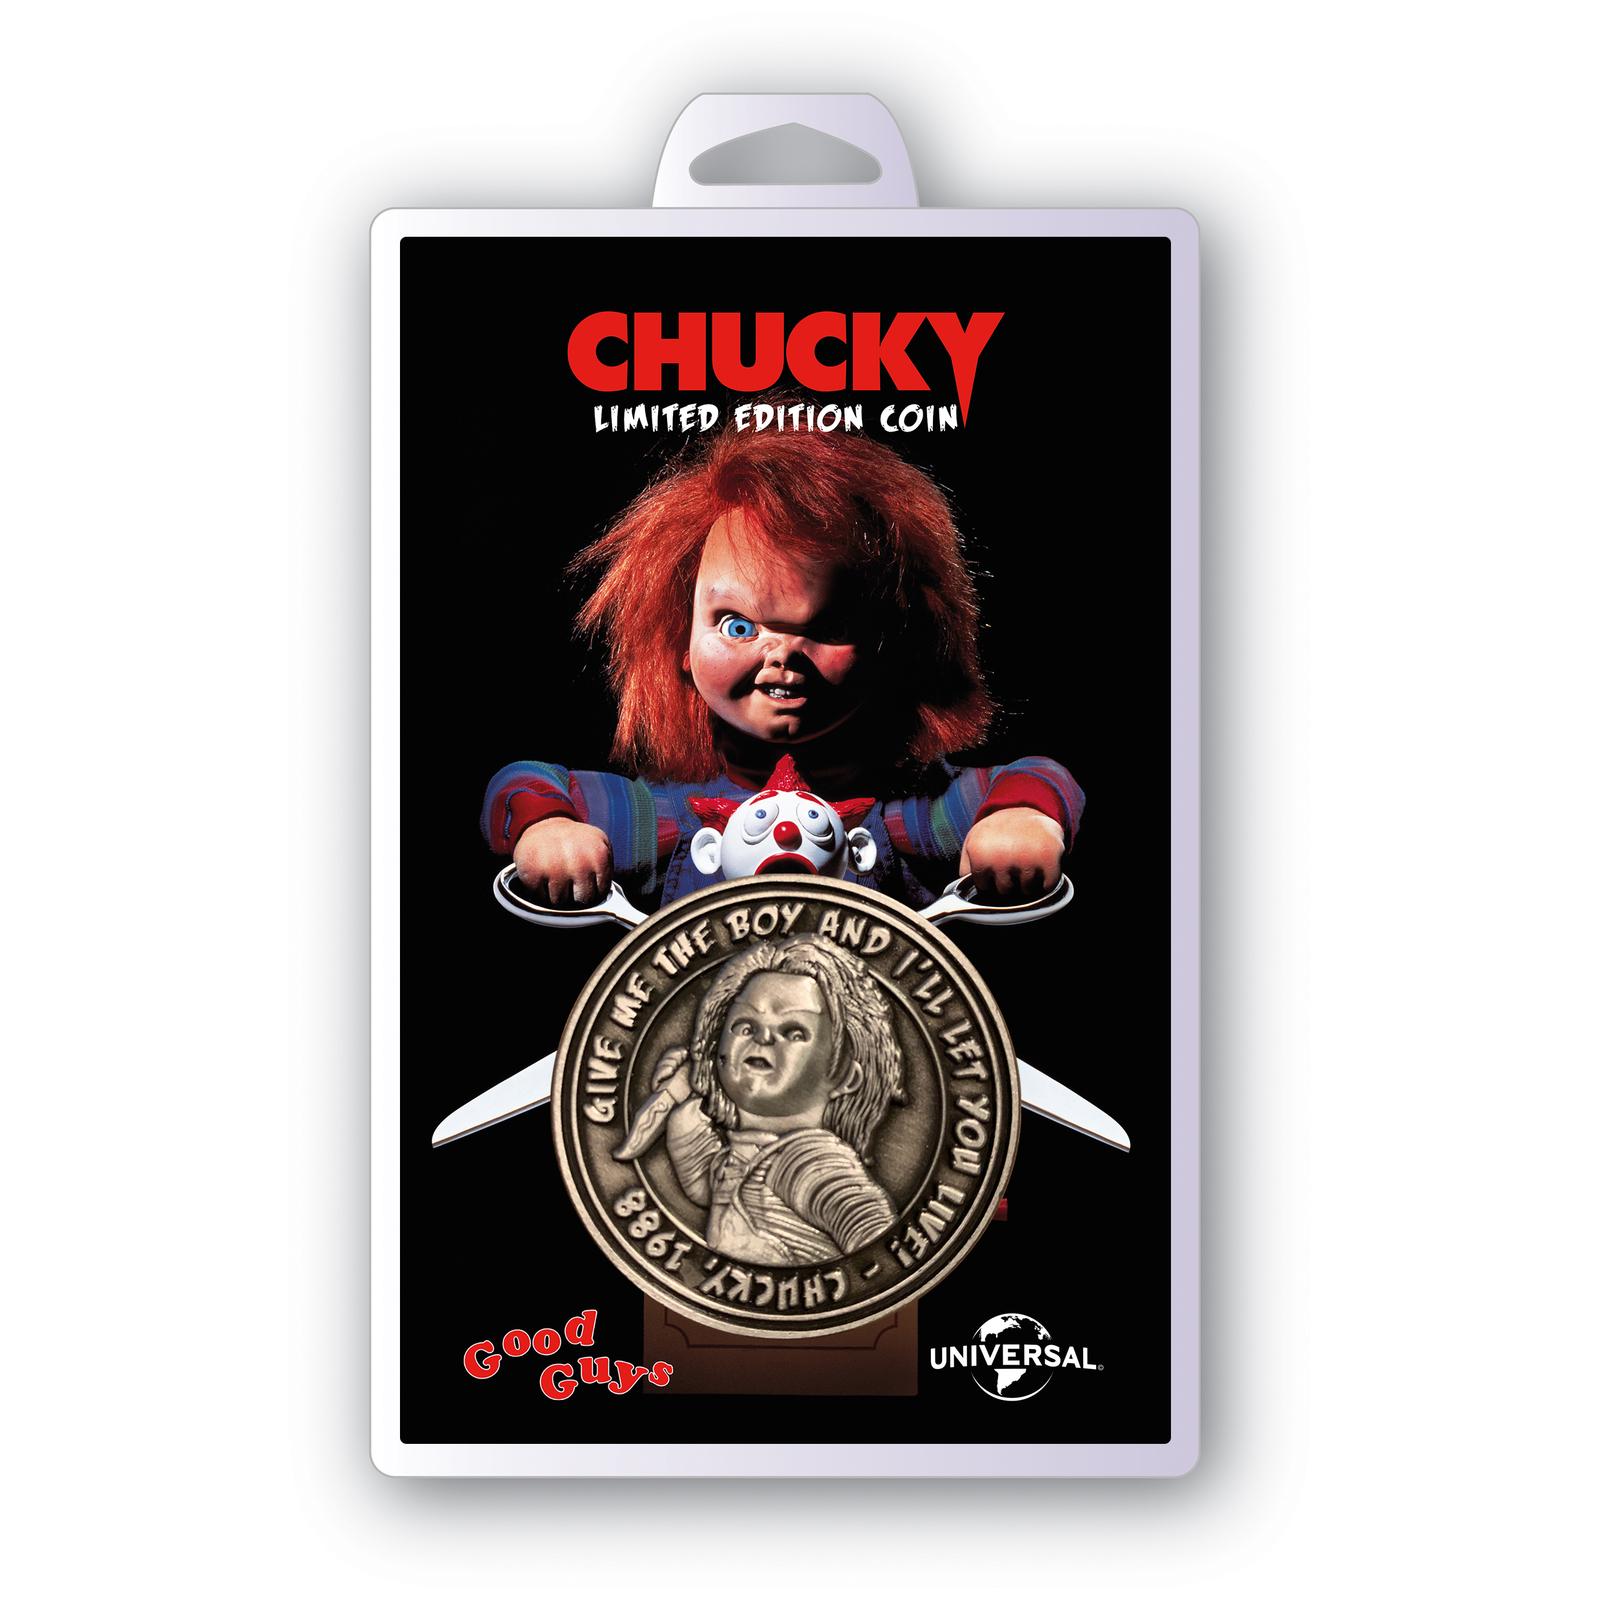 Child's Play: Collectible Coin - Chucky (2020) image